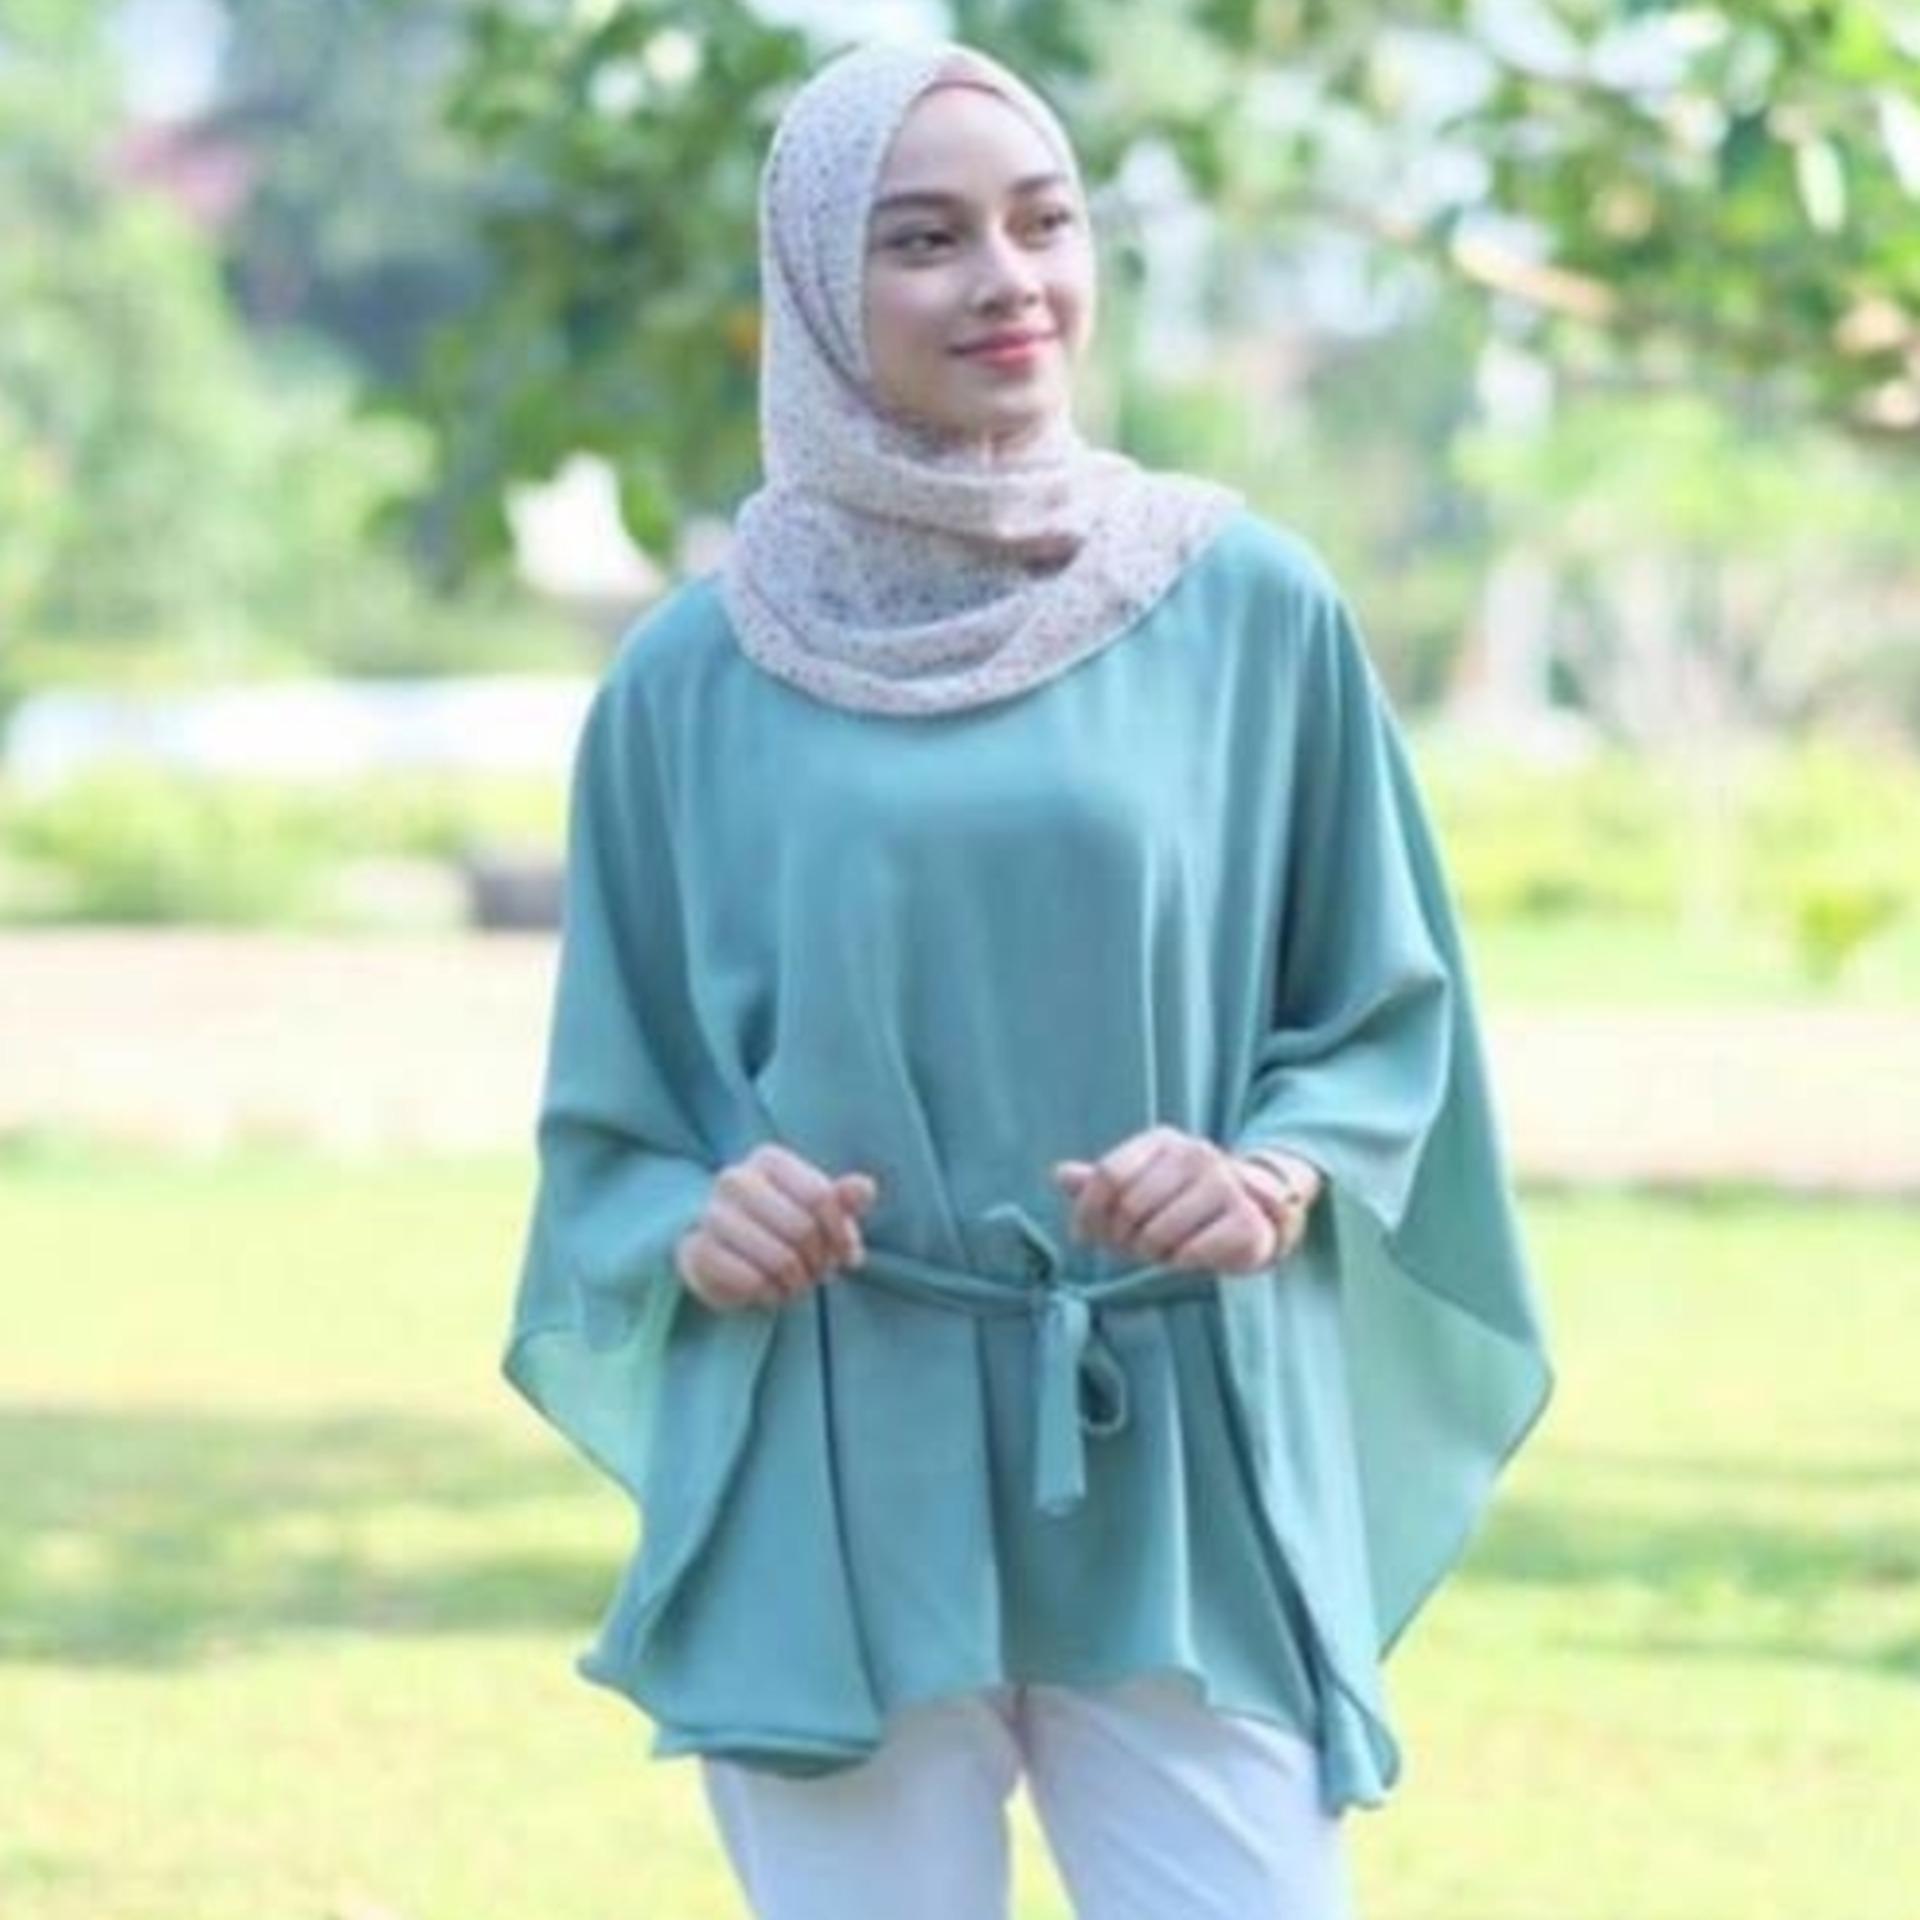 Promo Atasan Wanita - Clove Blouse - Tunik - Baju Muslim - Blus Muslim Murah